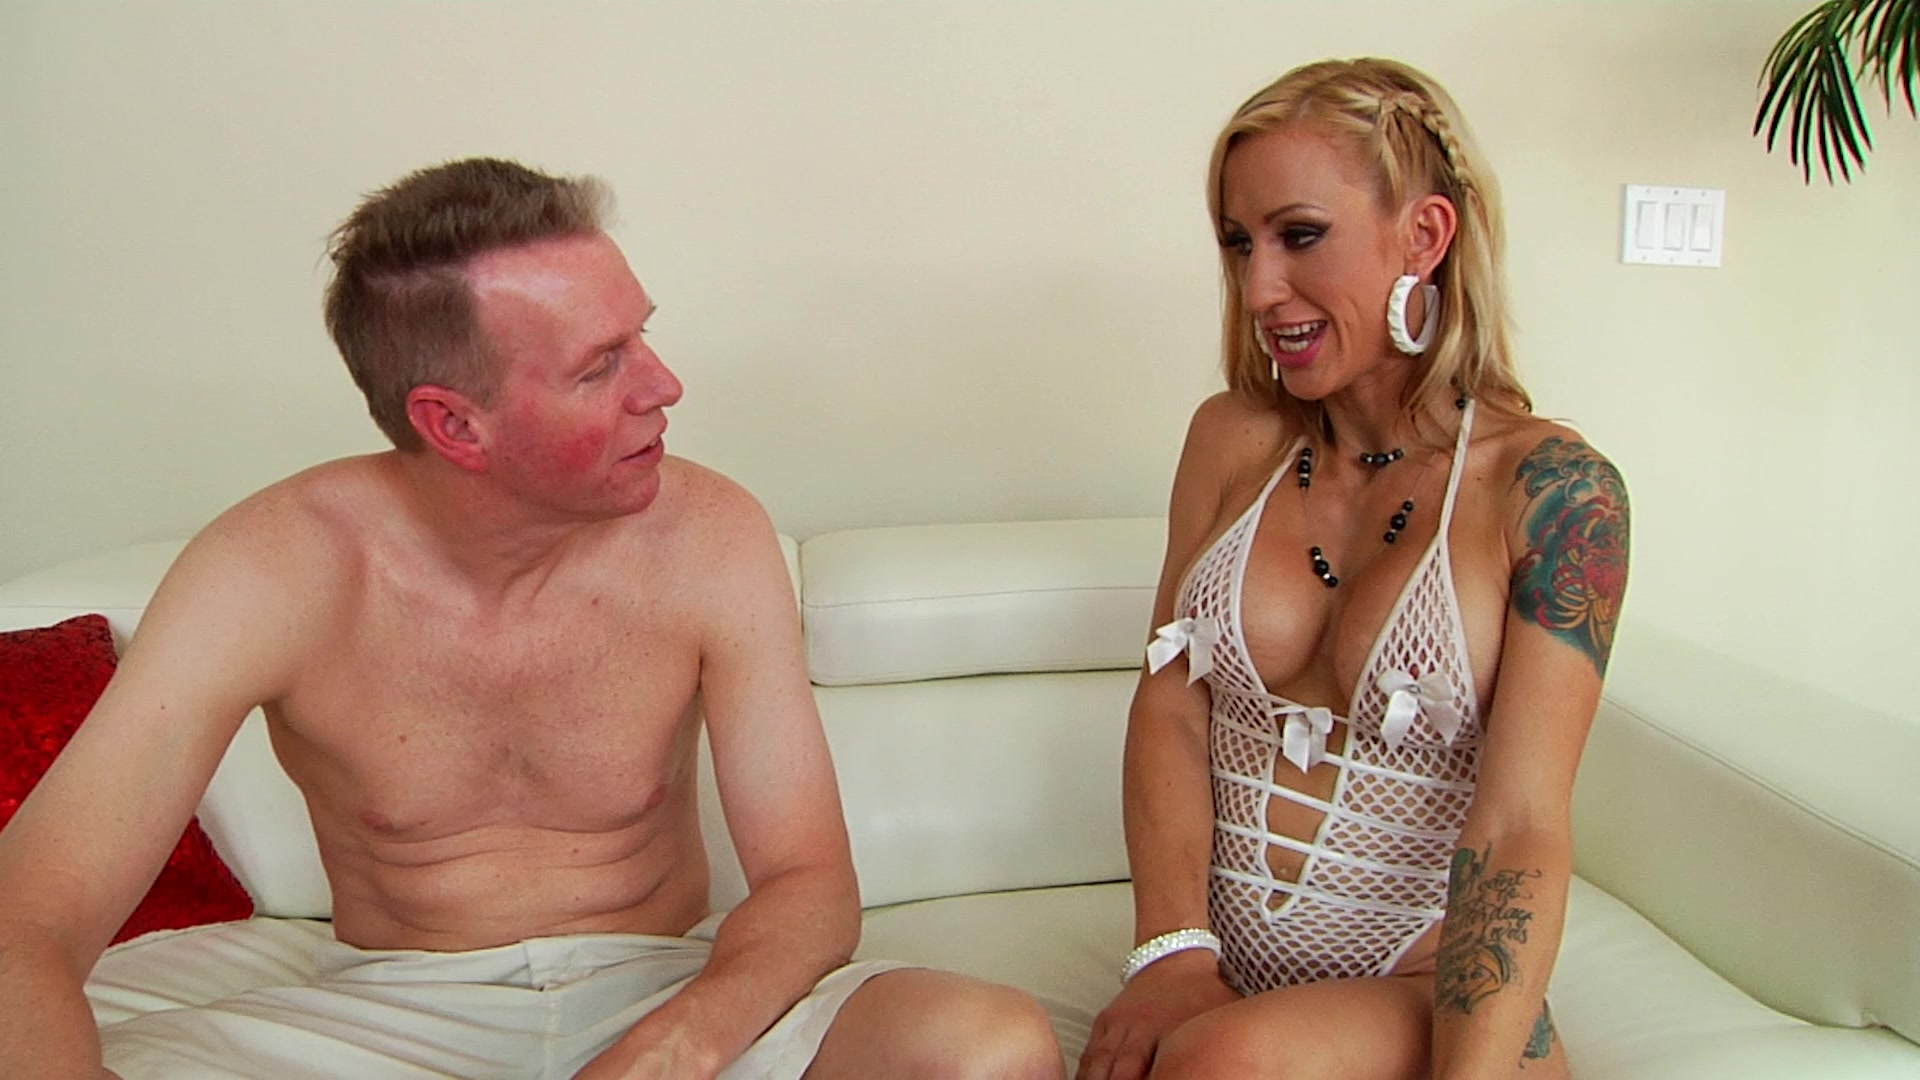 32yo british exgf hotel meet sensual morning session - 2 part 1